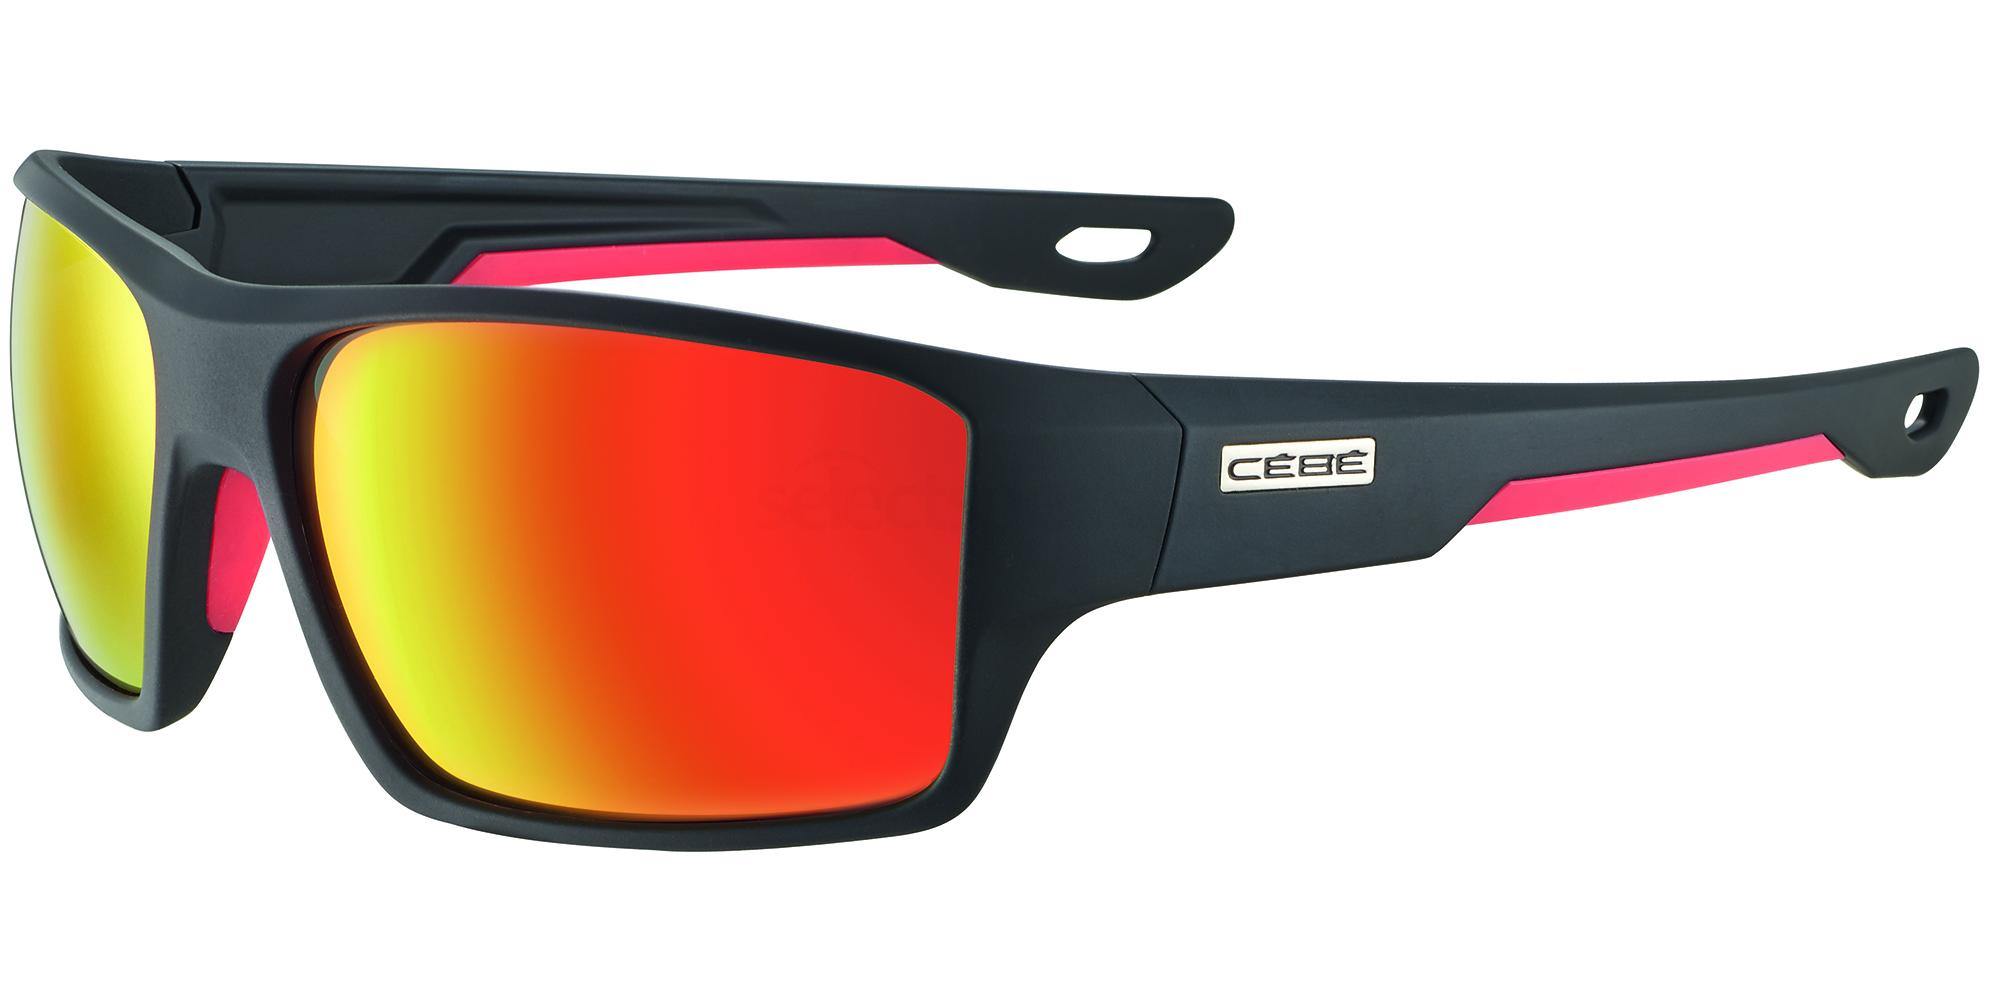 CBS064 STRICKLAND Sunglasses, Cebe